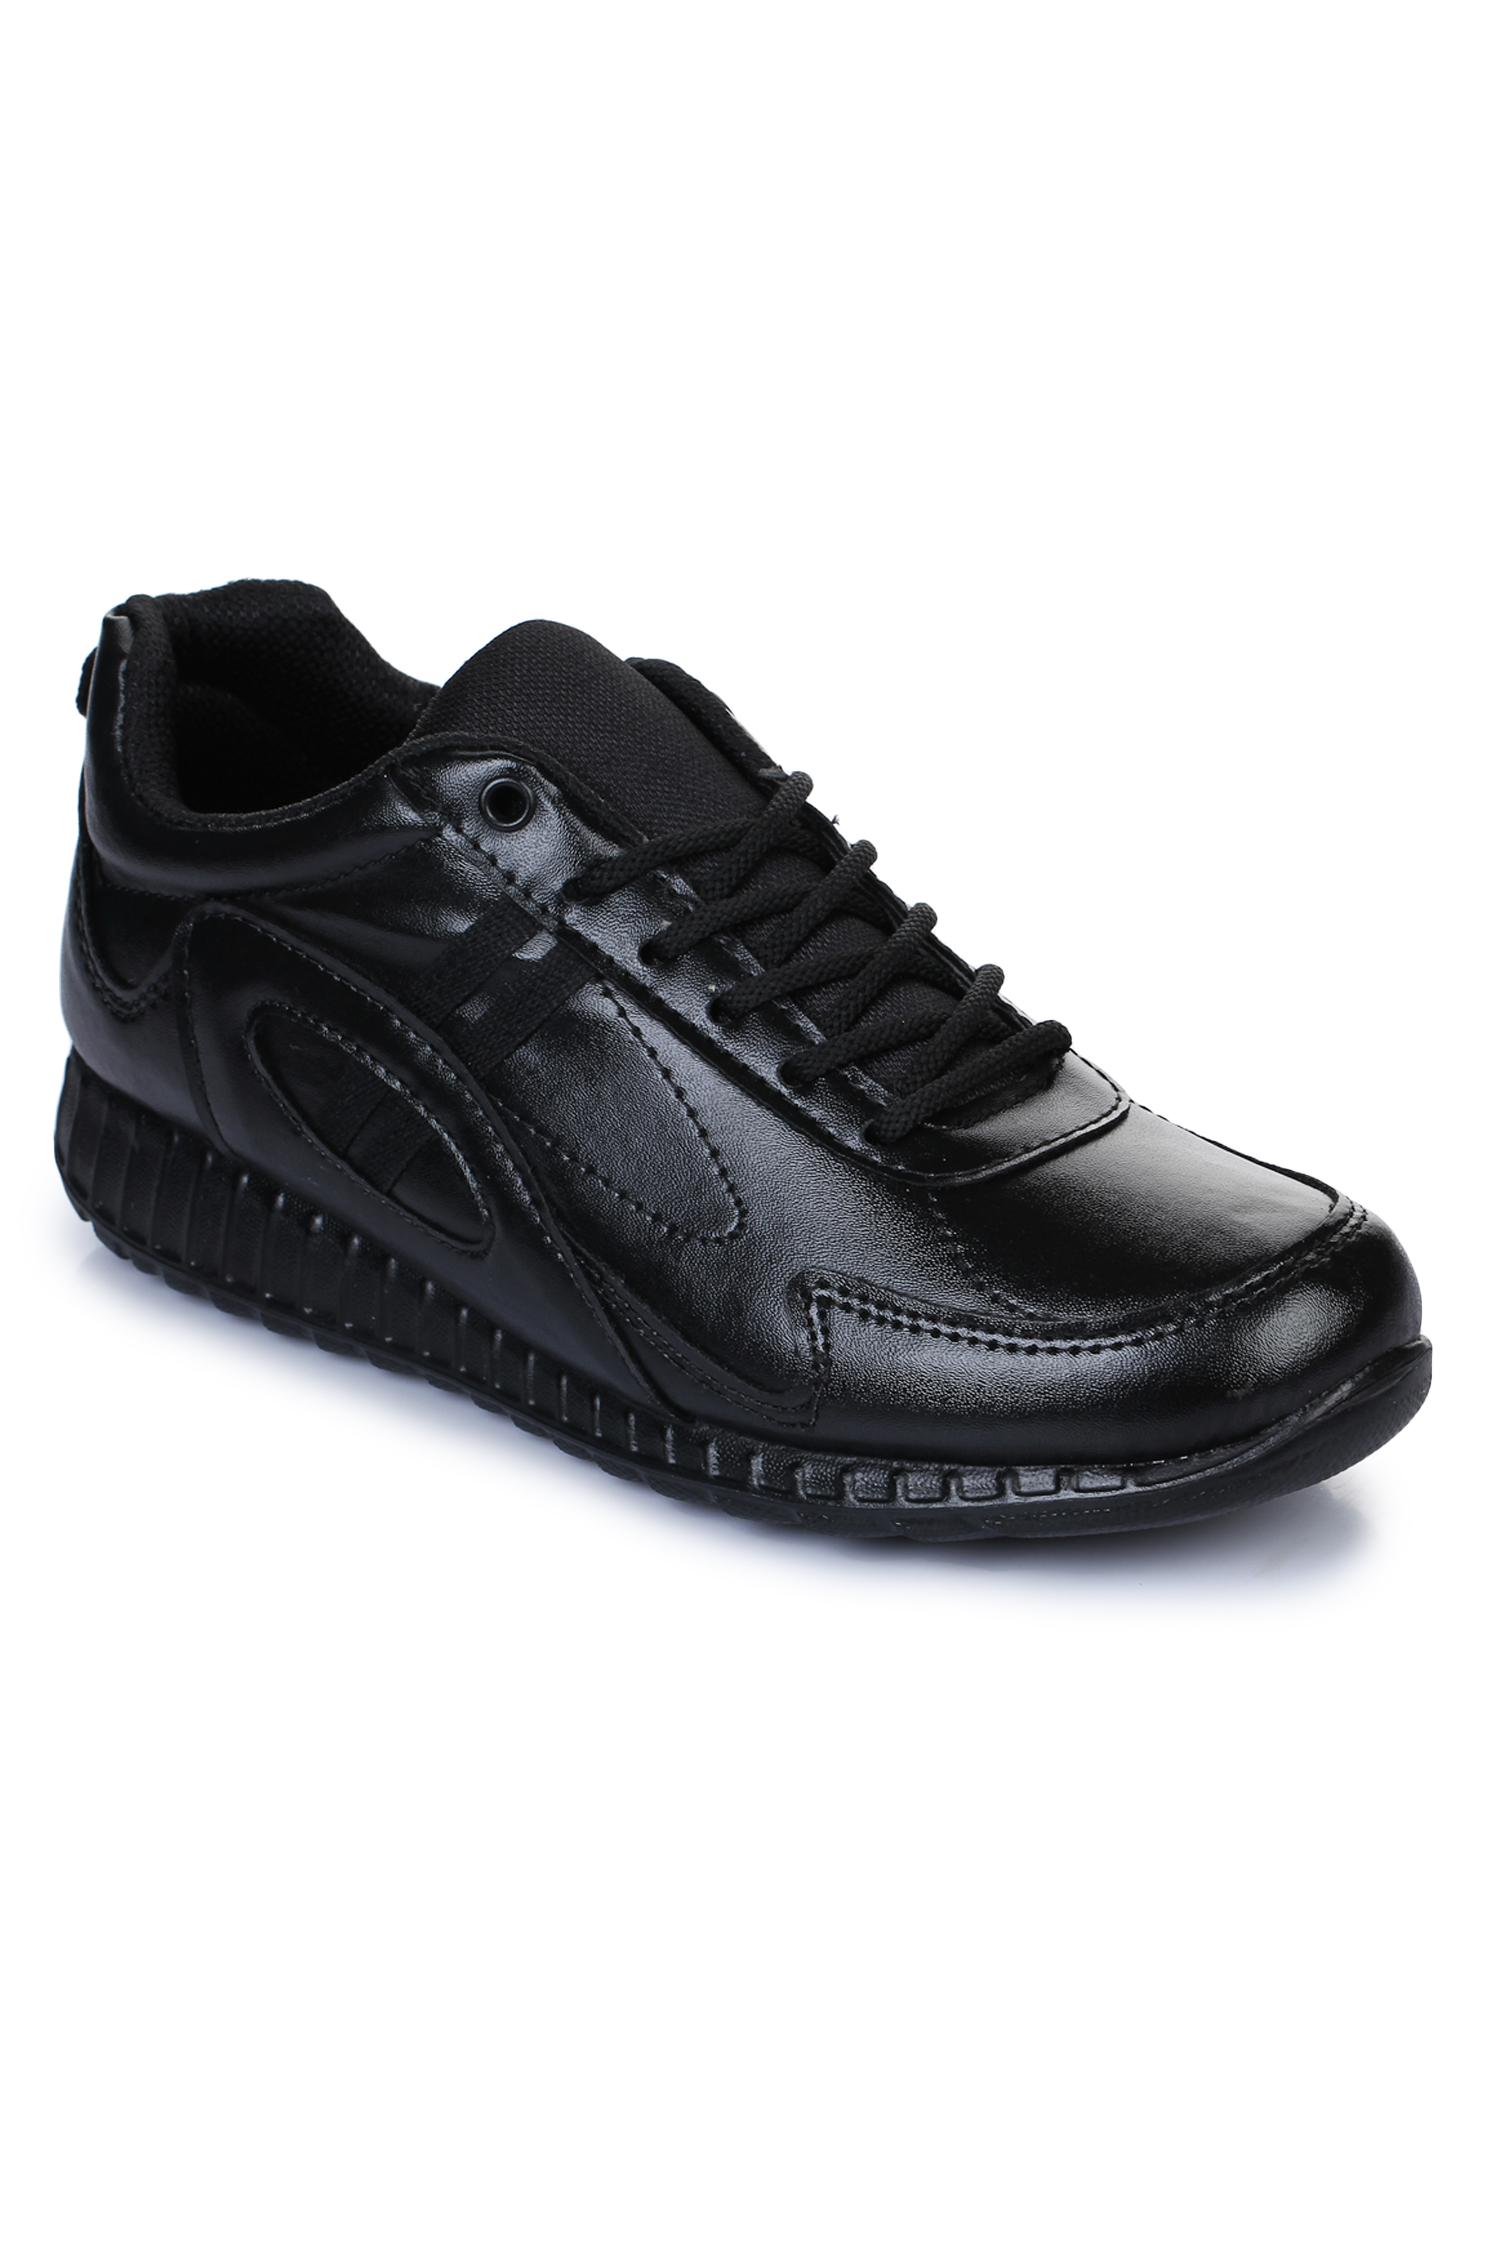 Liberty | Liberty Force 10 Black School Shoes 9906-02T_Black For - Men